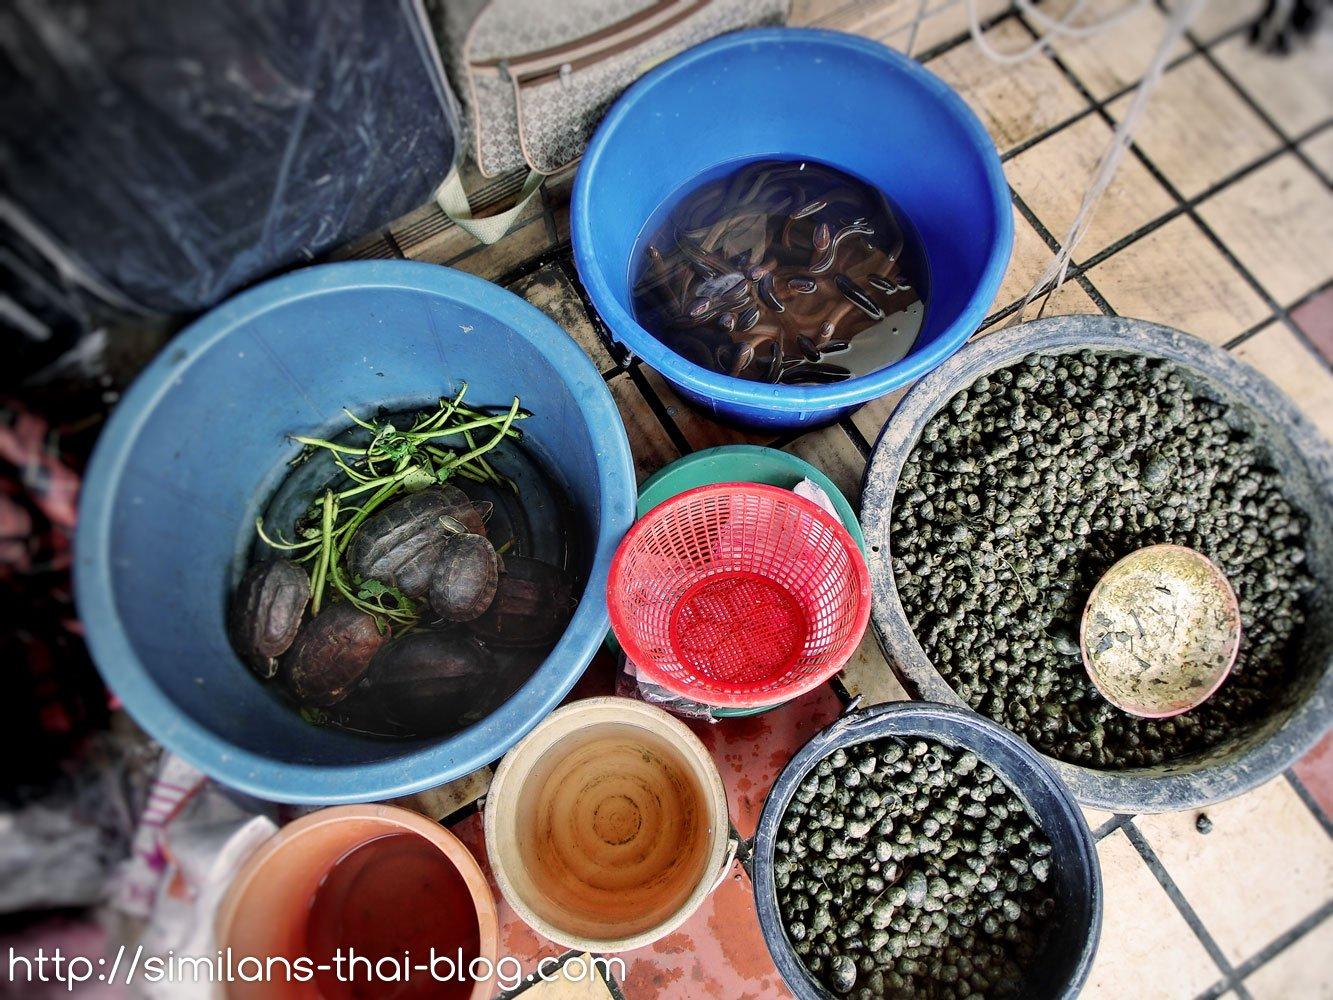 Turtle fresh market